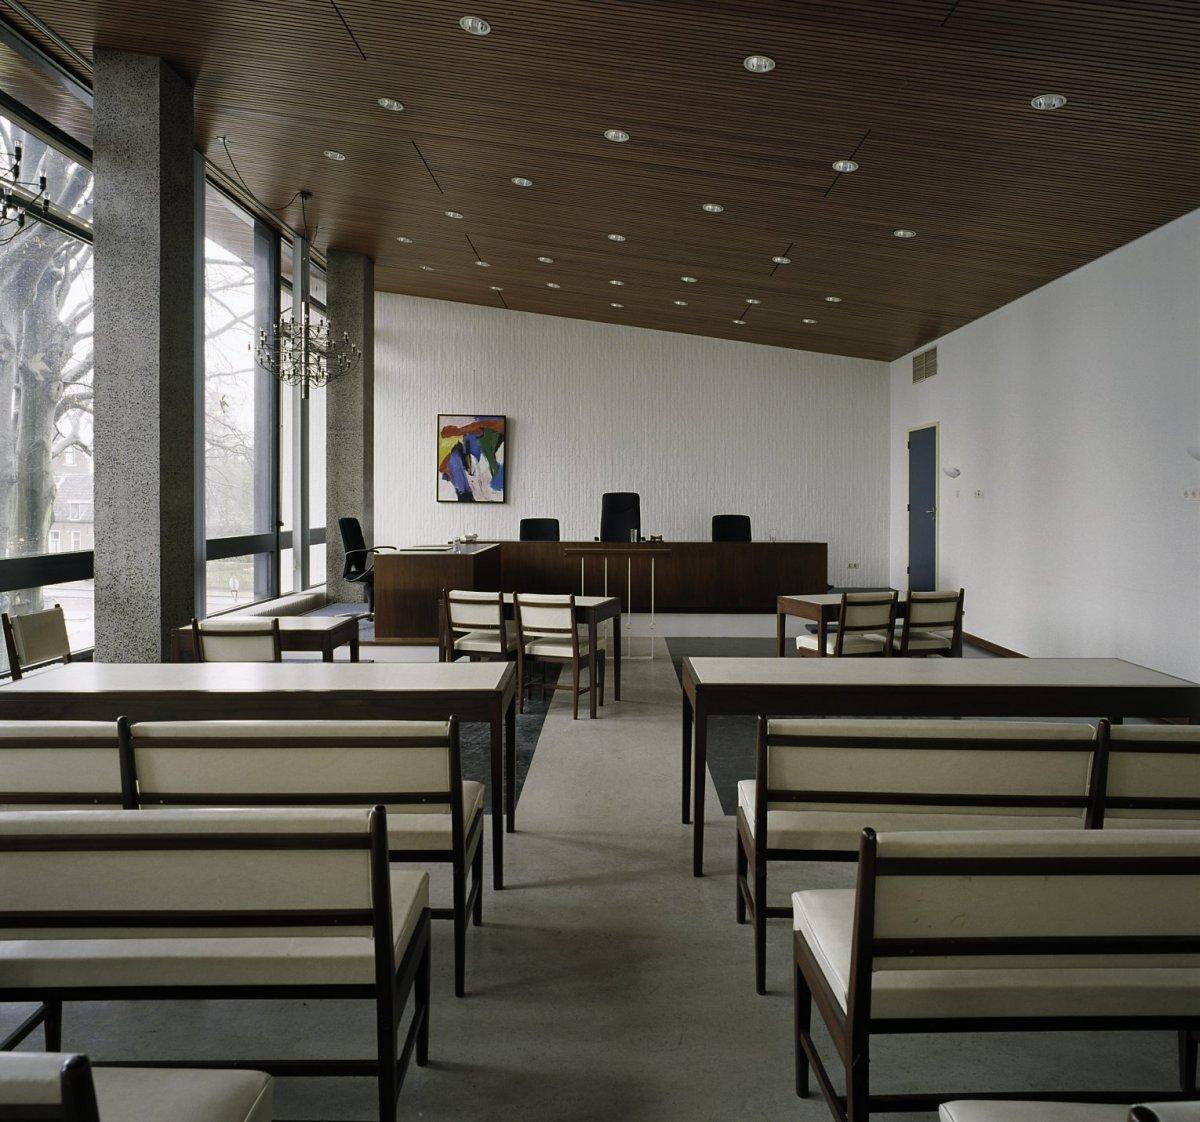 File:Interieur, overzicht van rechtzaal 2 - Hilversum - 20389415 ...